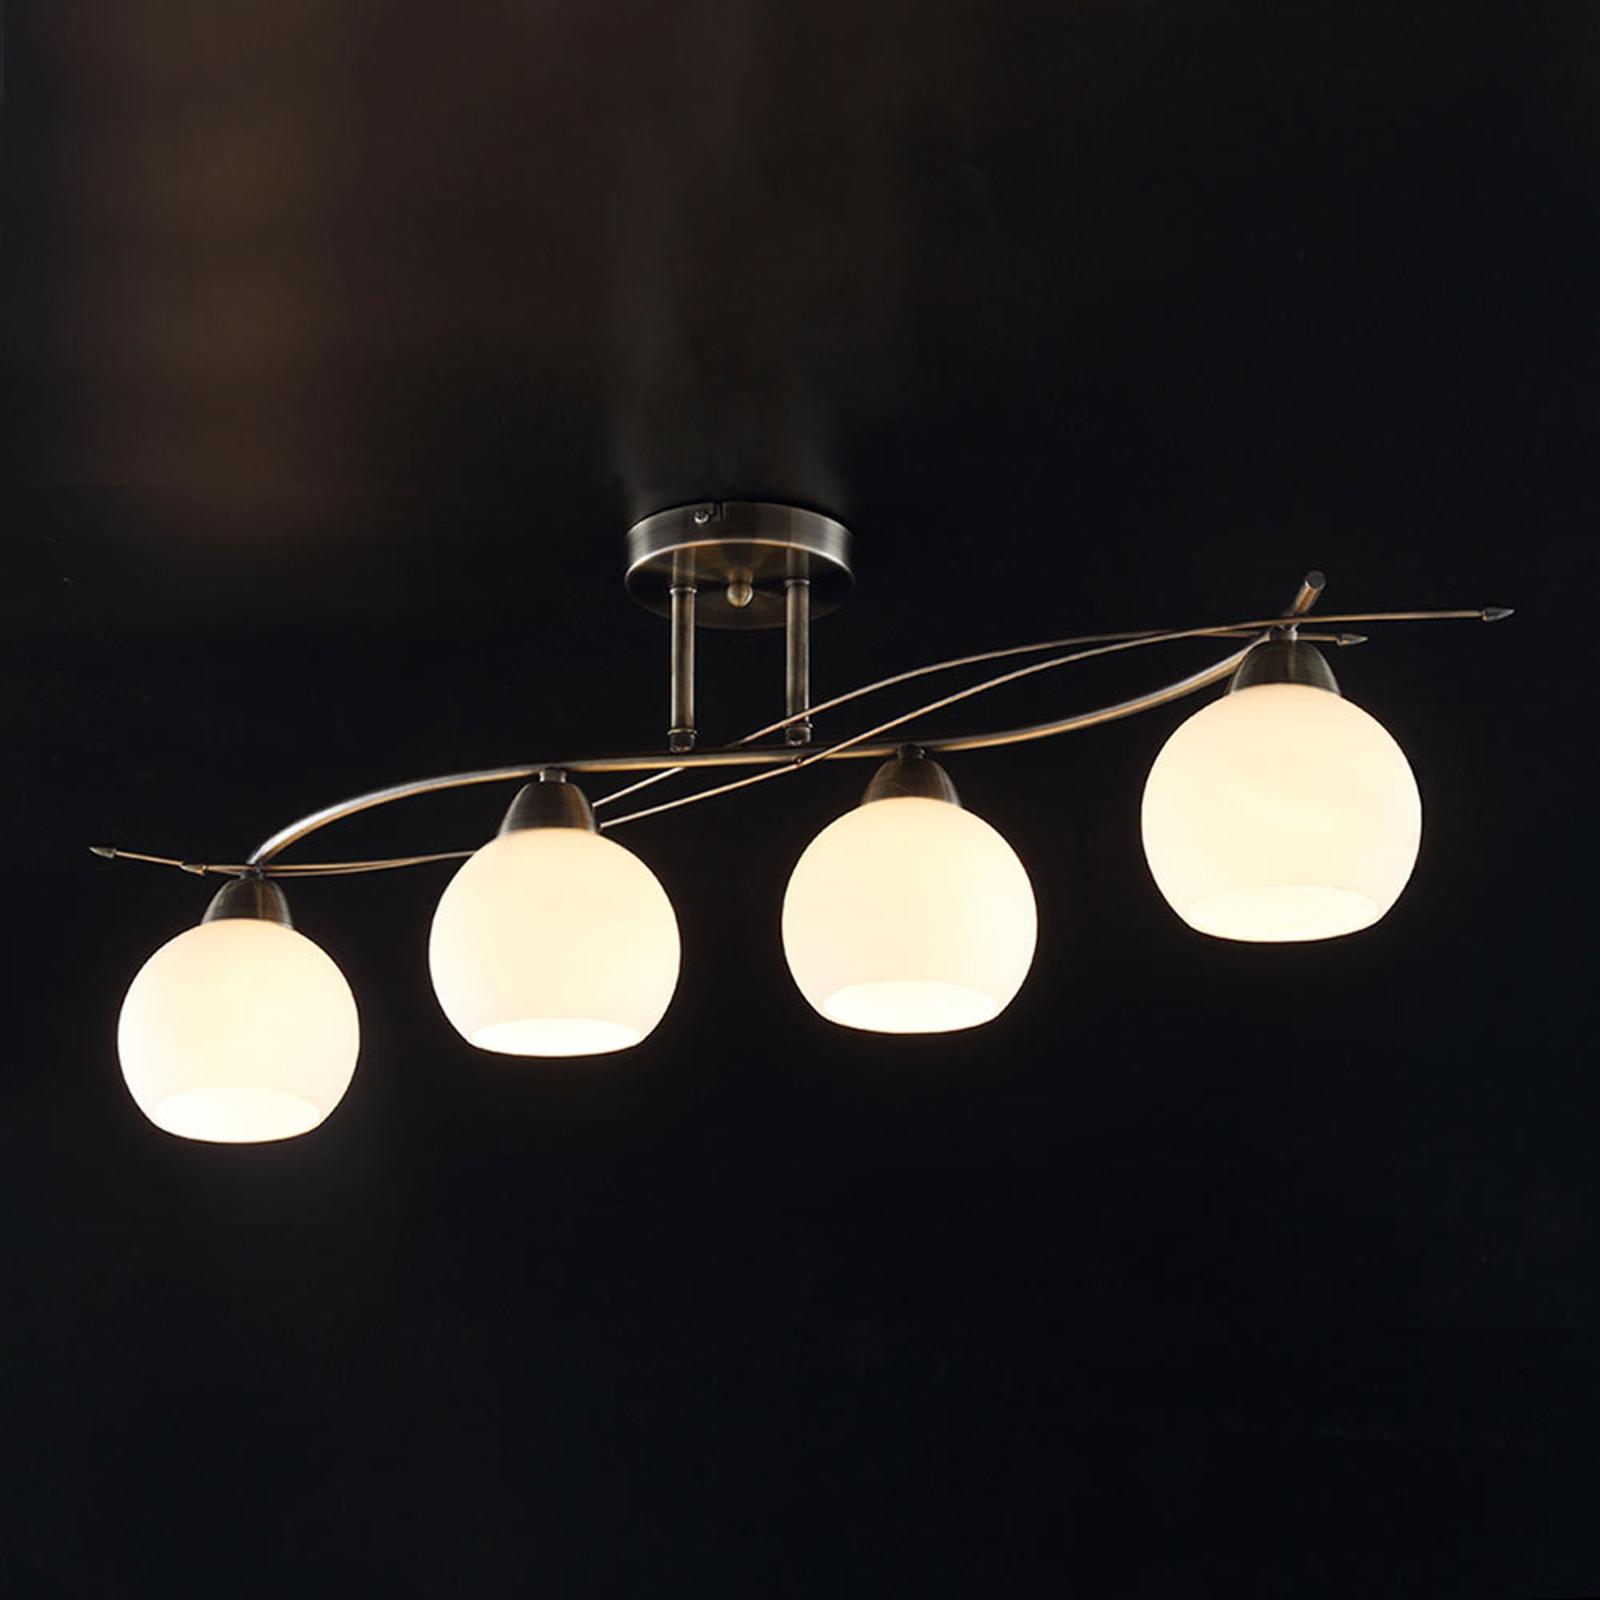 Czteropunktowa lampa sufitowa Leanda